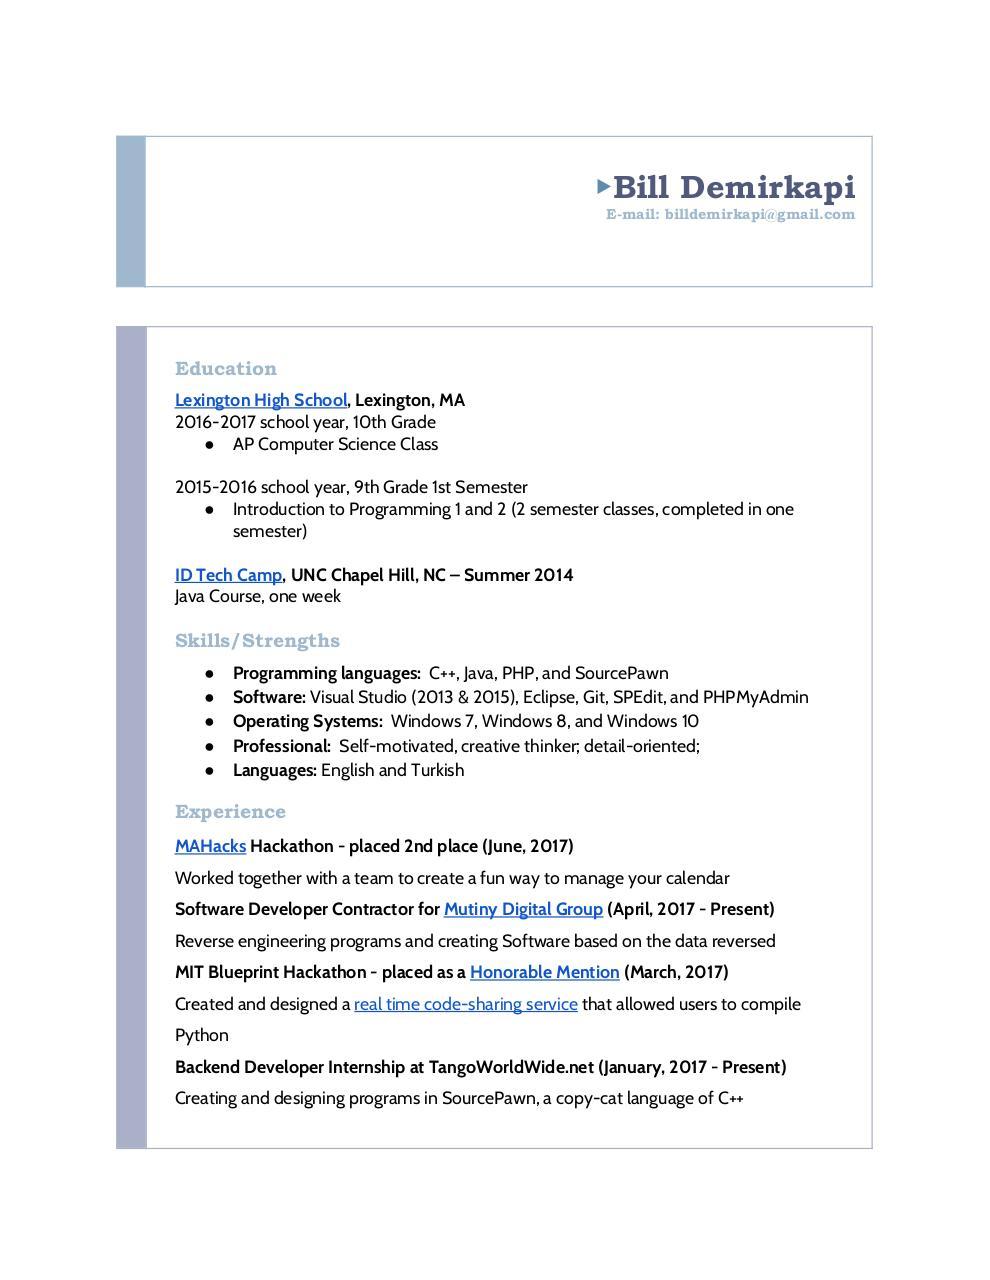 bd resume - PDF Archive